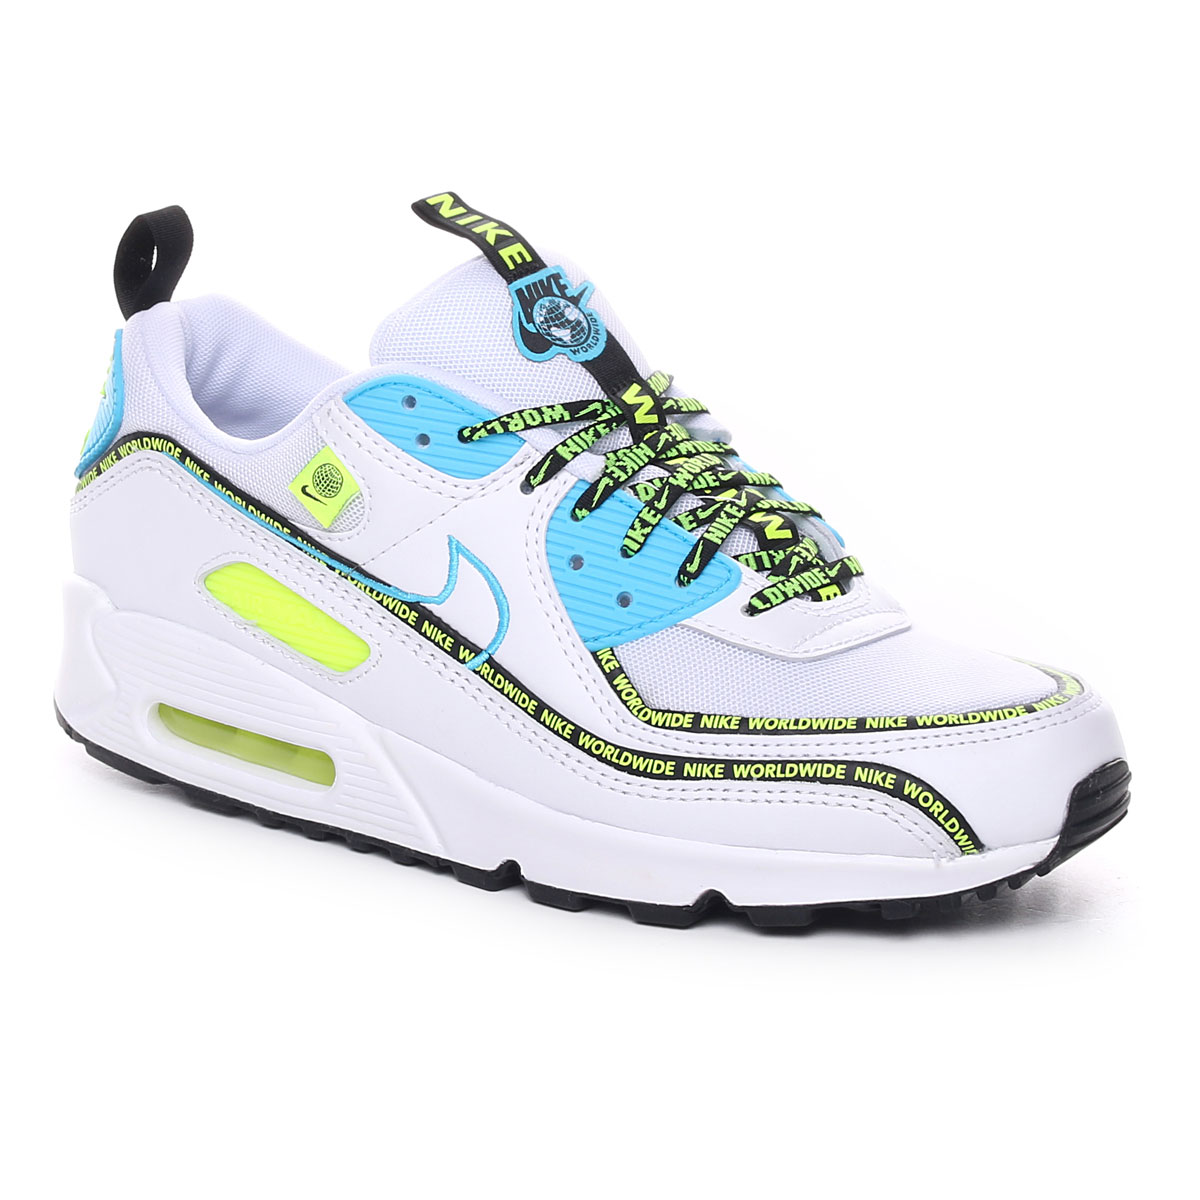 Nike Air Max 90 Se Worldwide Pack Uomo Bianco Giallo Fluo